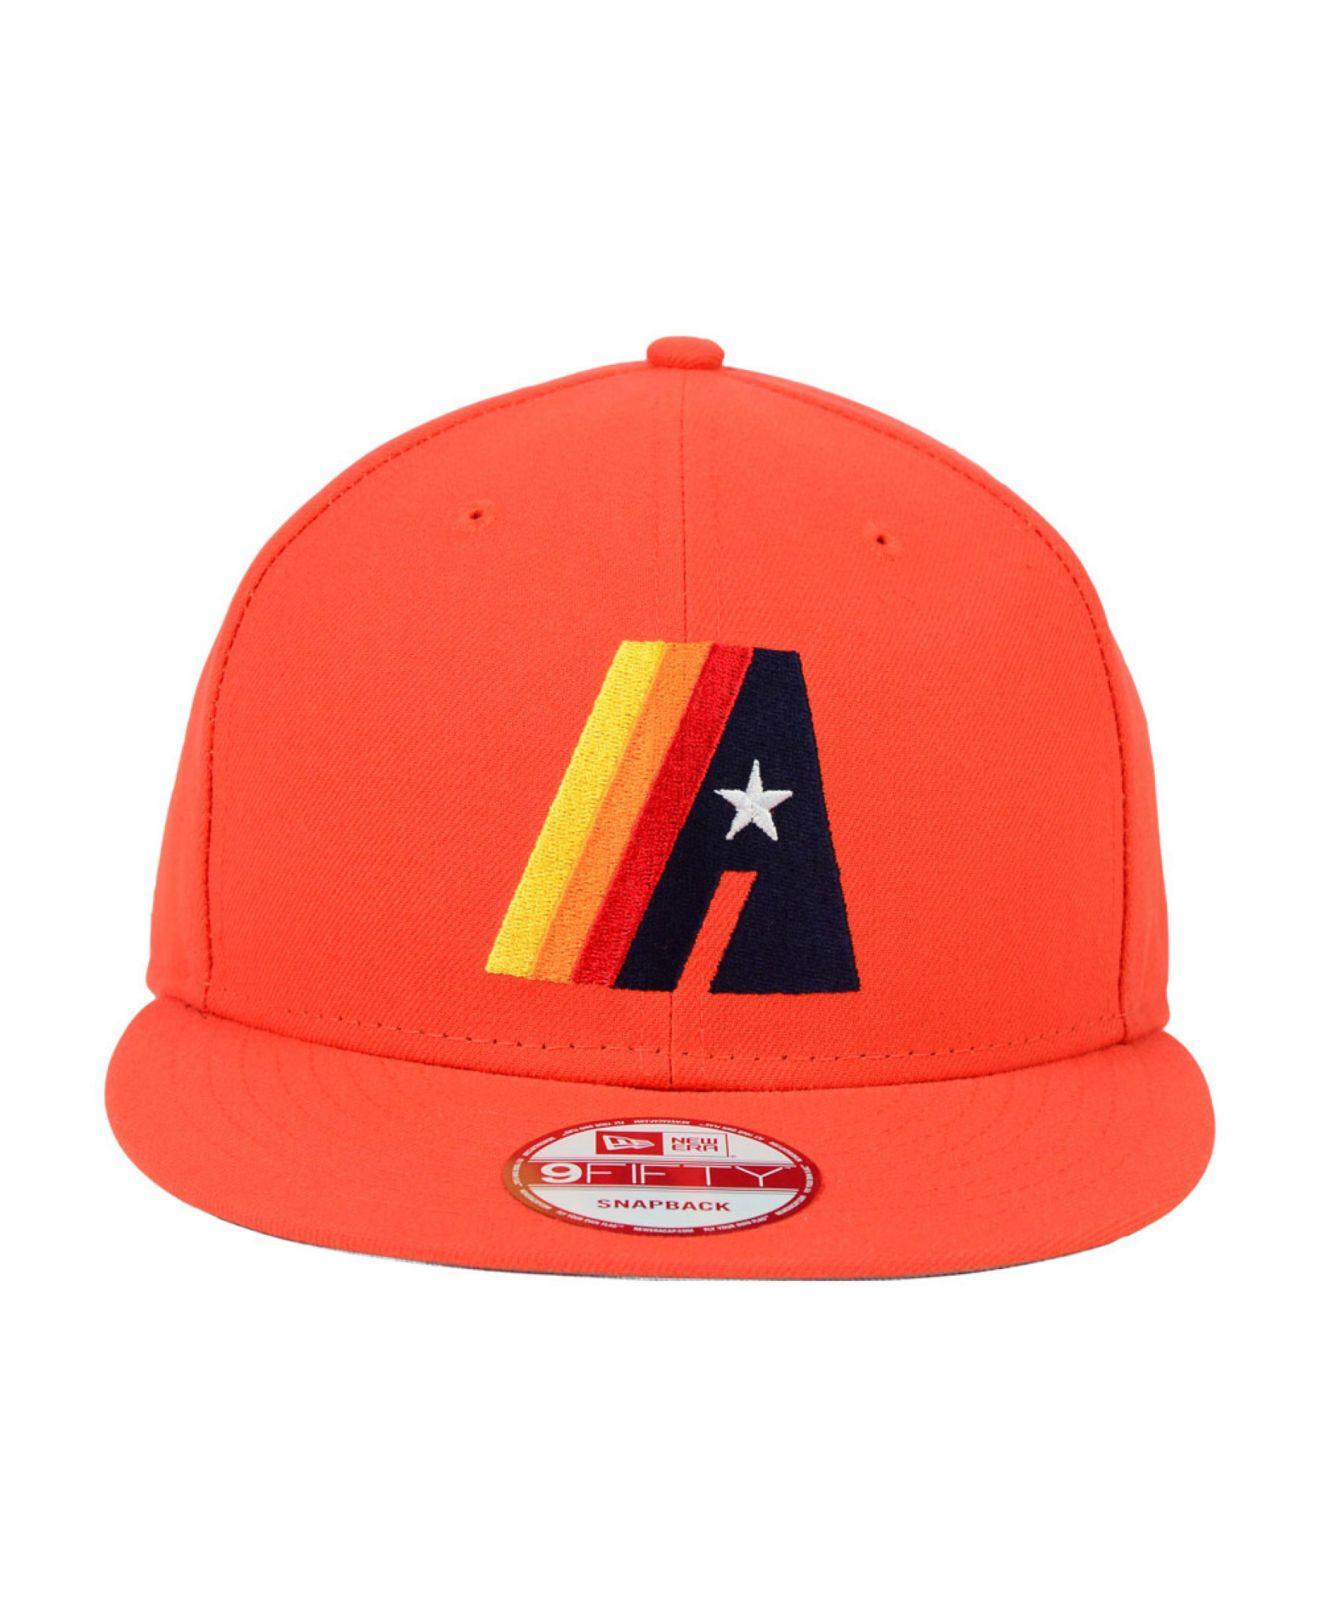 huge selection of 42a6c 84c05 ... wholesale lyst ktz houston astros 9fifty snapback cap in orange for men  fe3a4 c852b